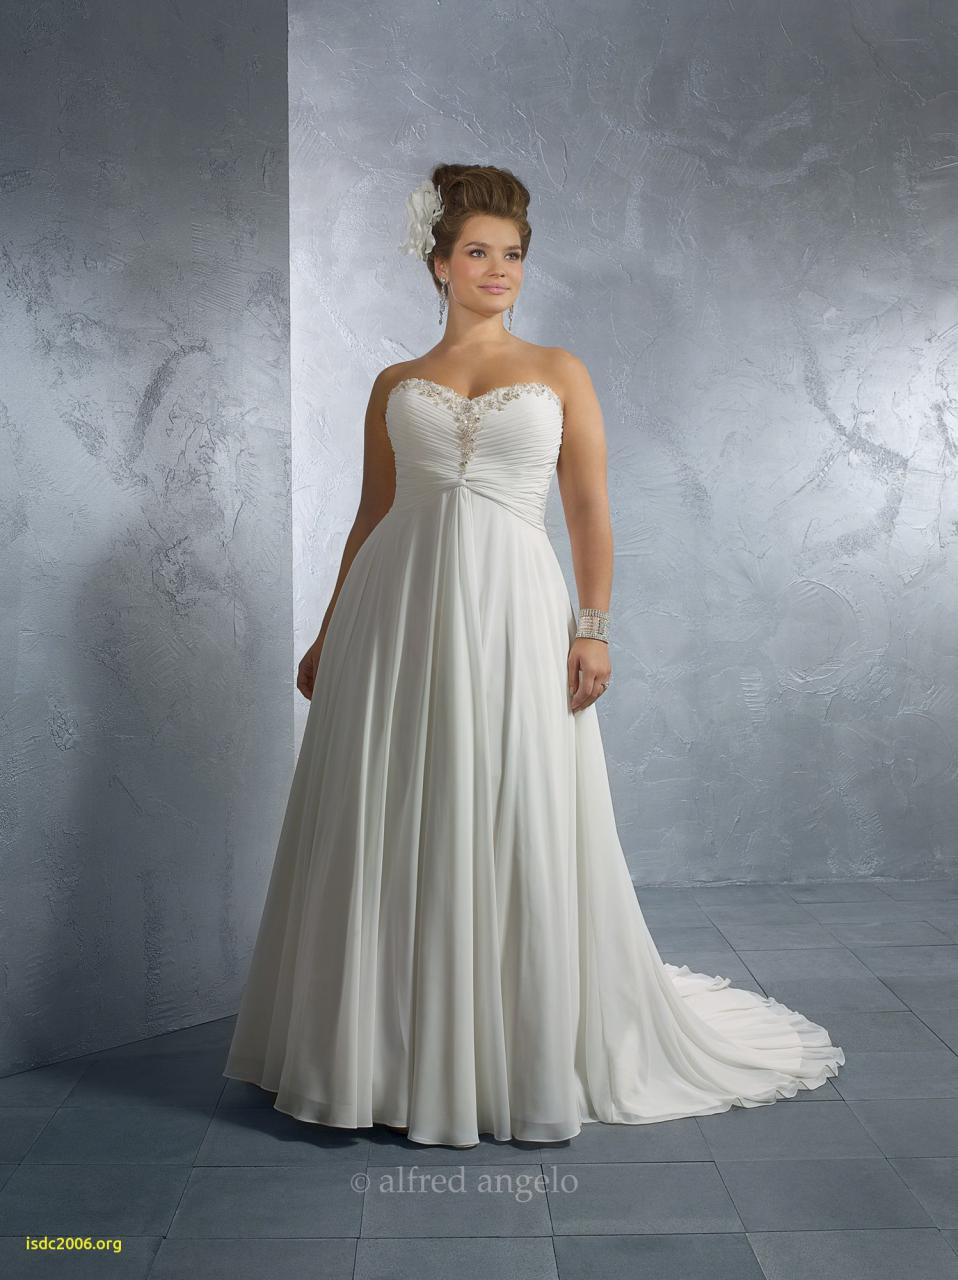 Fantastic Farah Diba Wedding Dress Image Collection Wedding Ideas